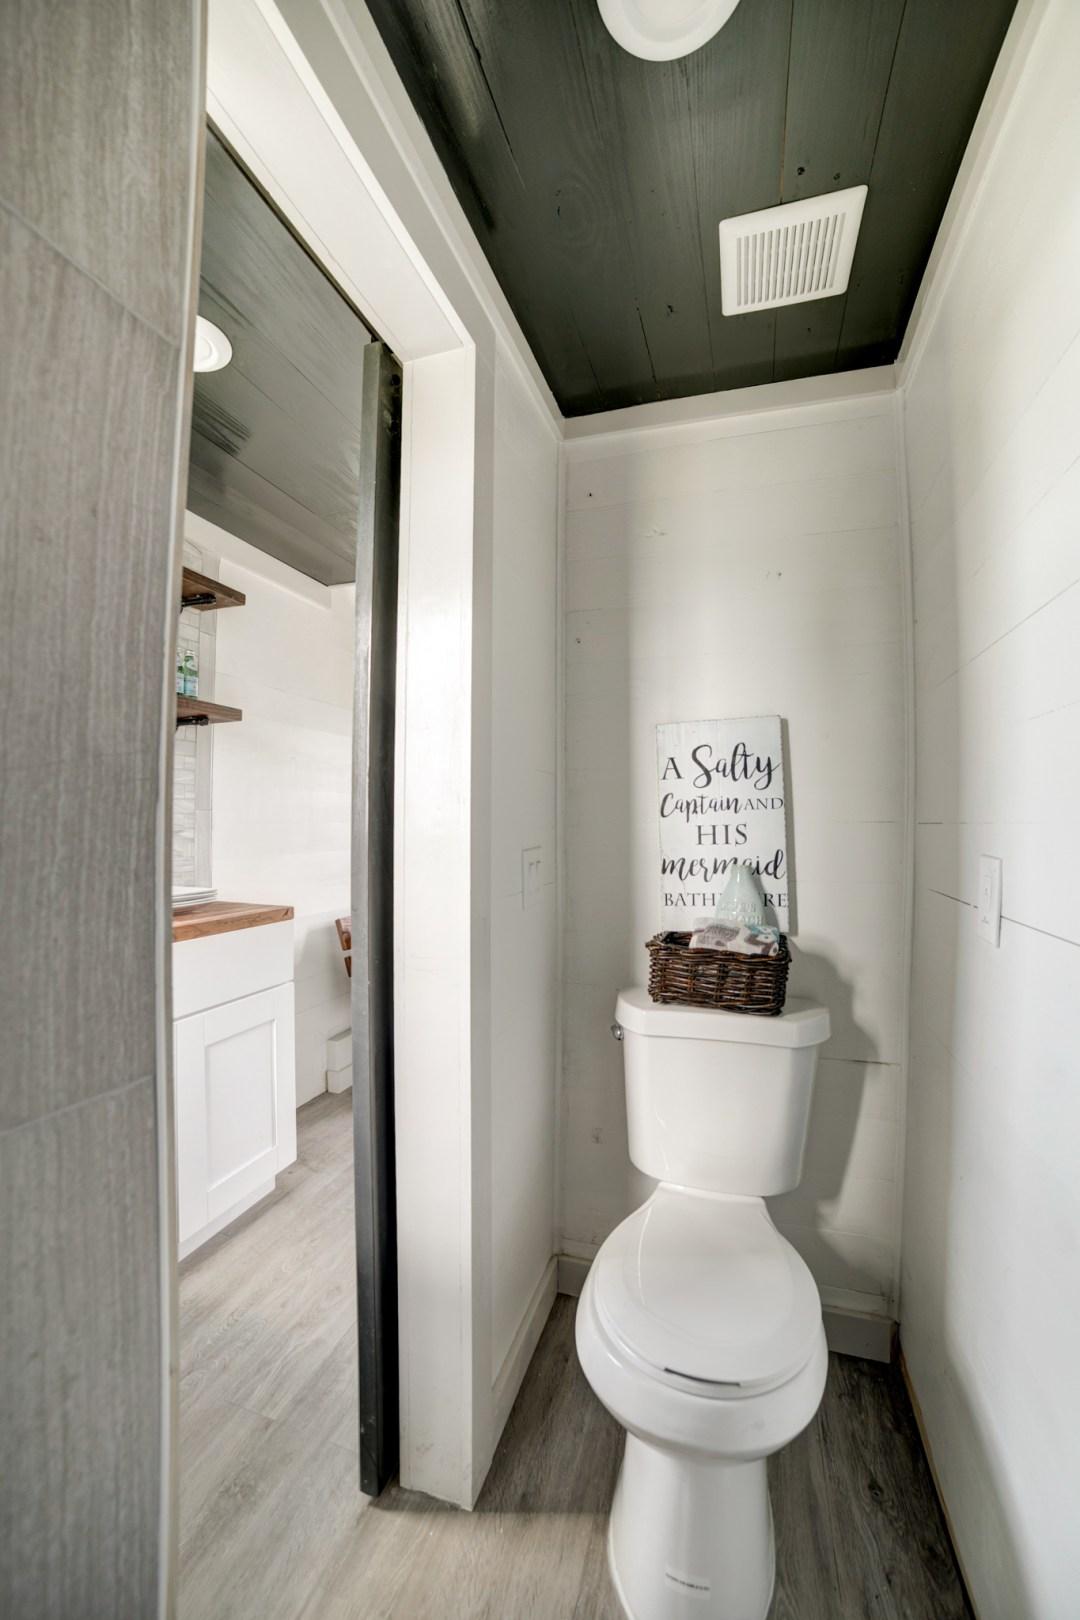 The Burg Bathroom